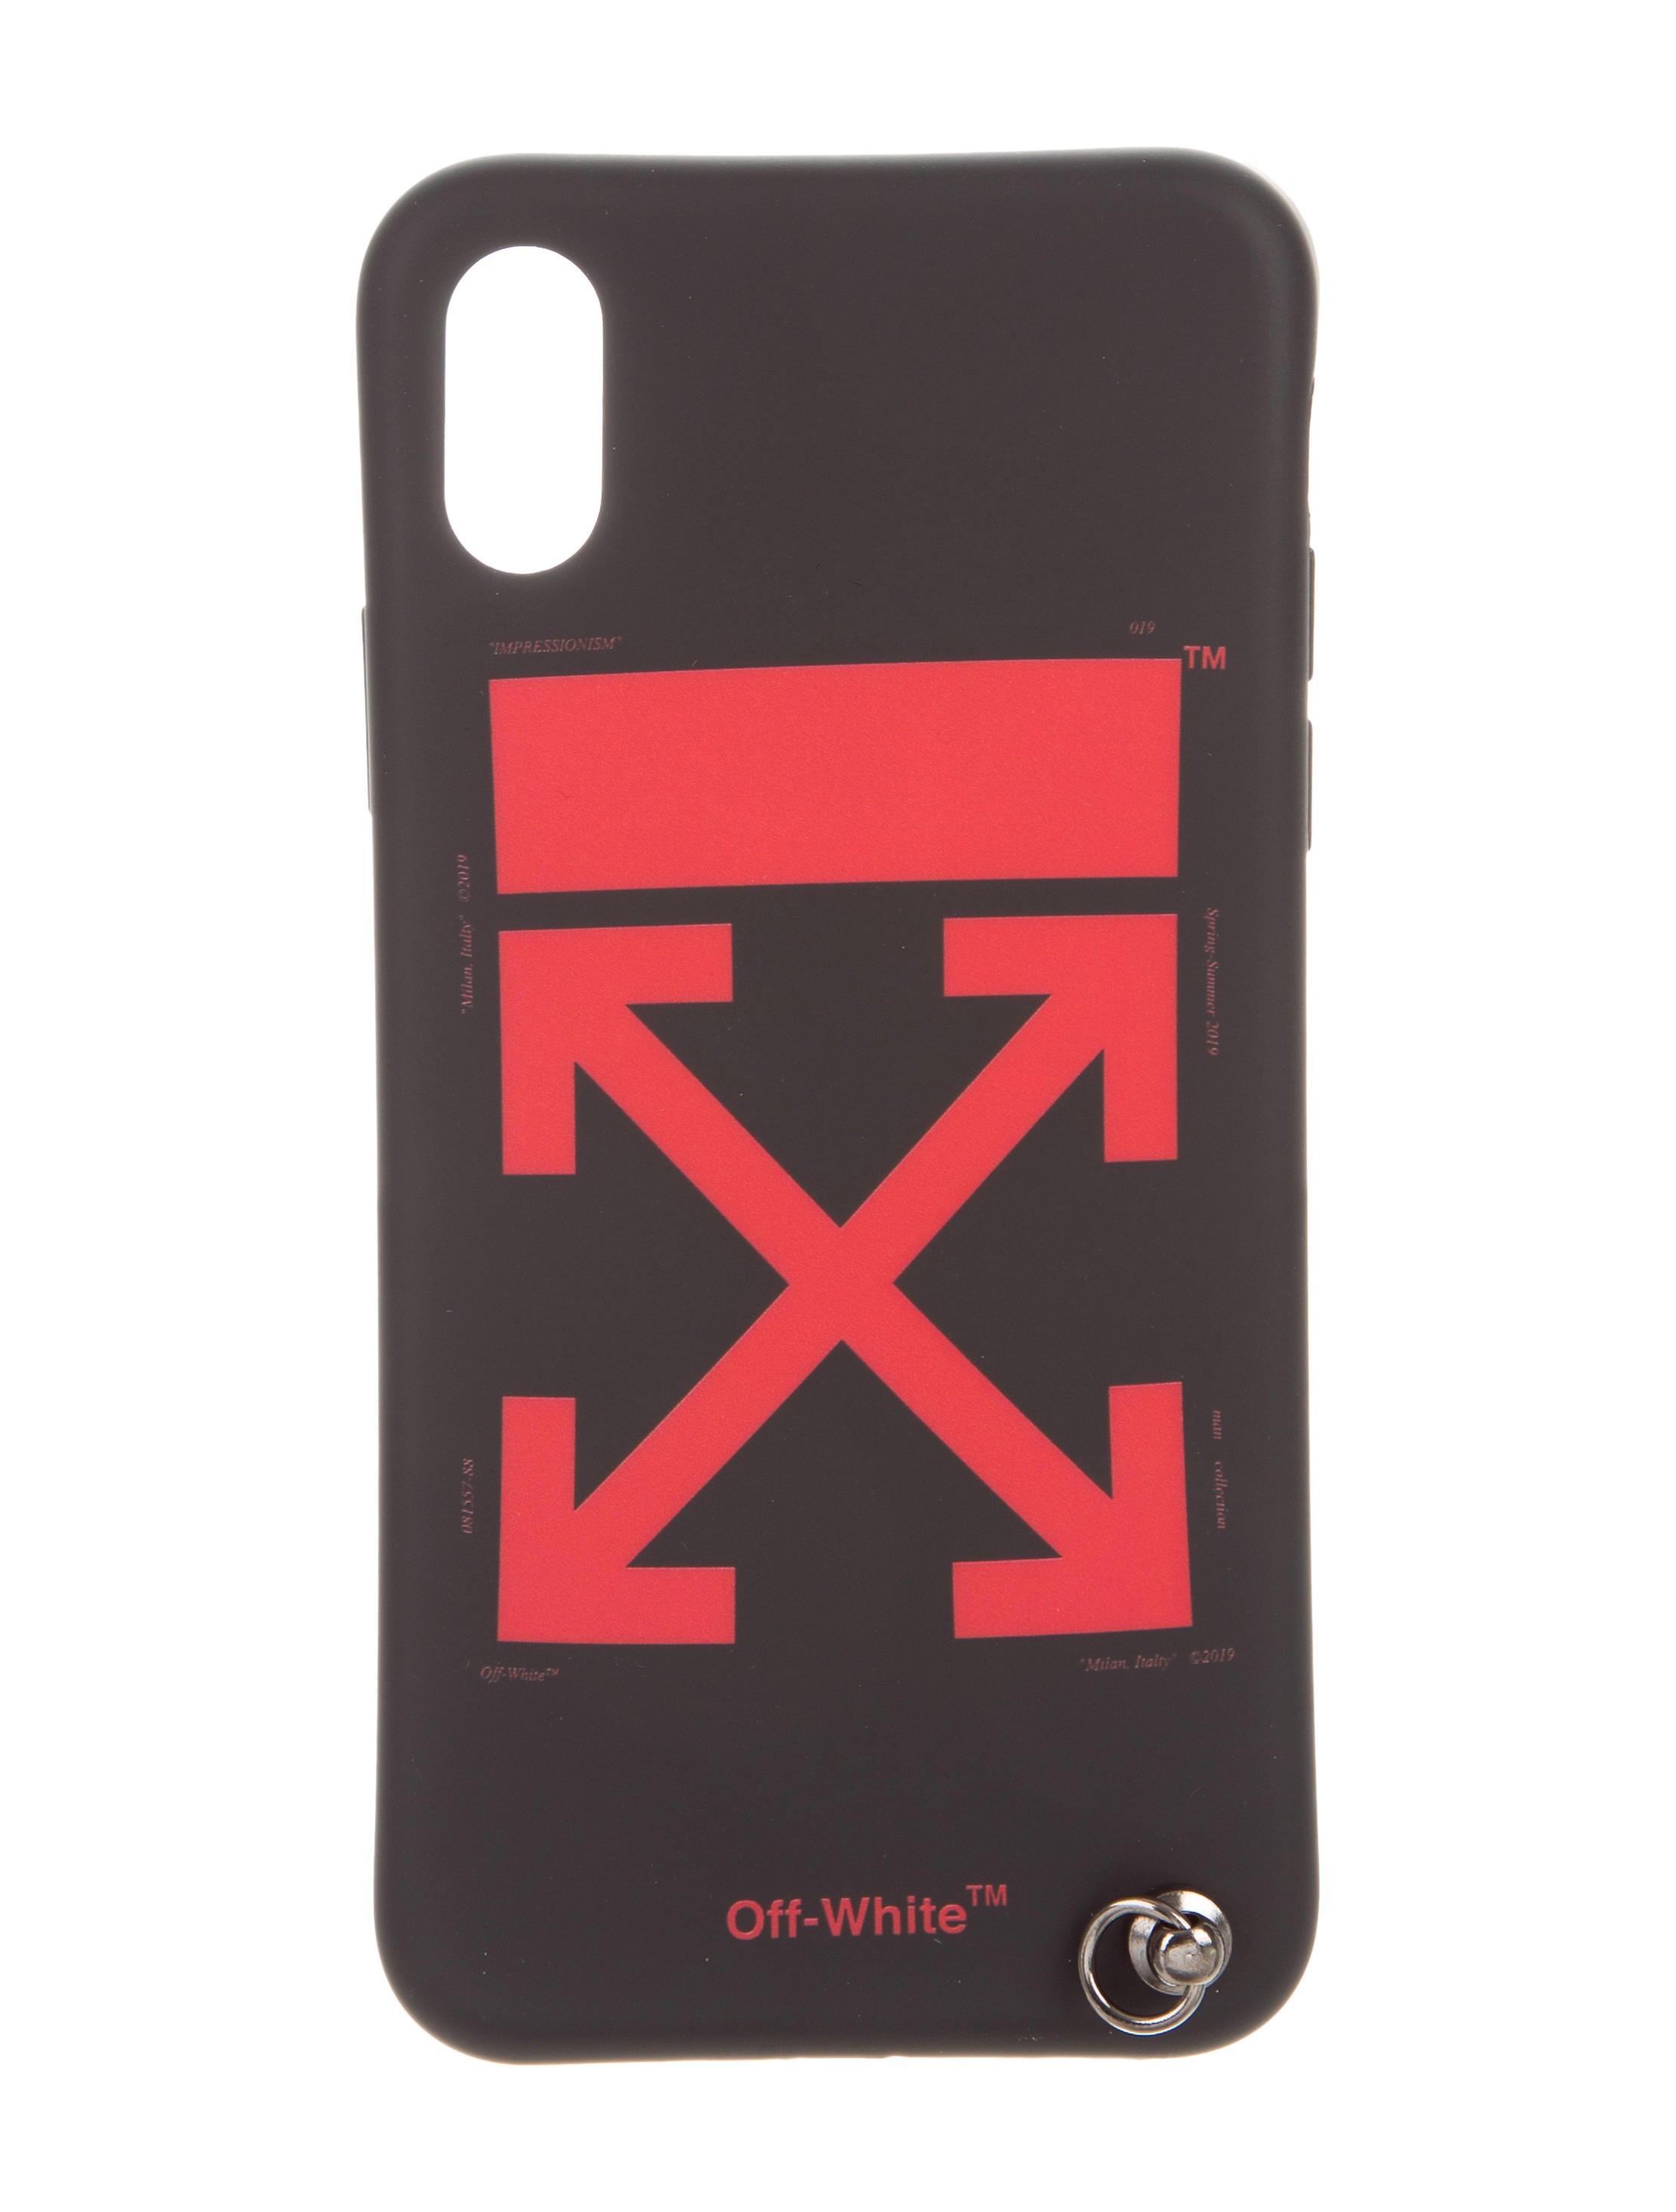 1b1dad947ad8 Off-White c o Virgil Abloh Arrow iPhone X Case w  Tags - Technology ...